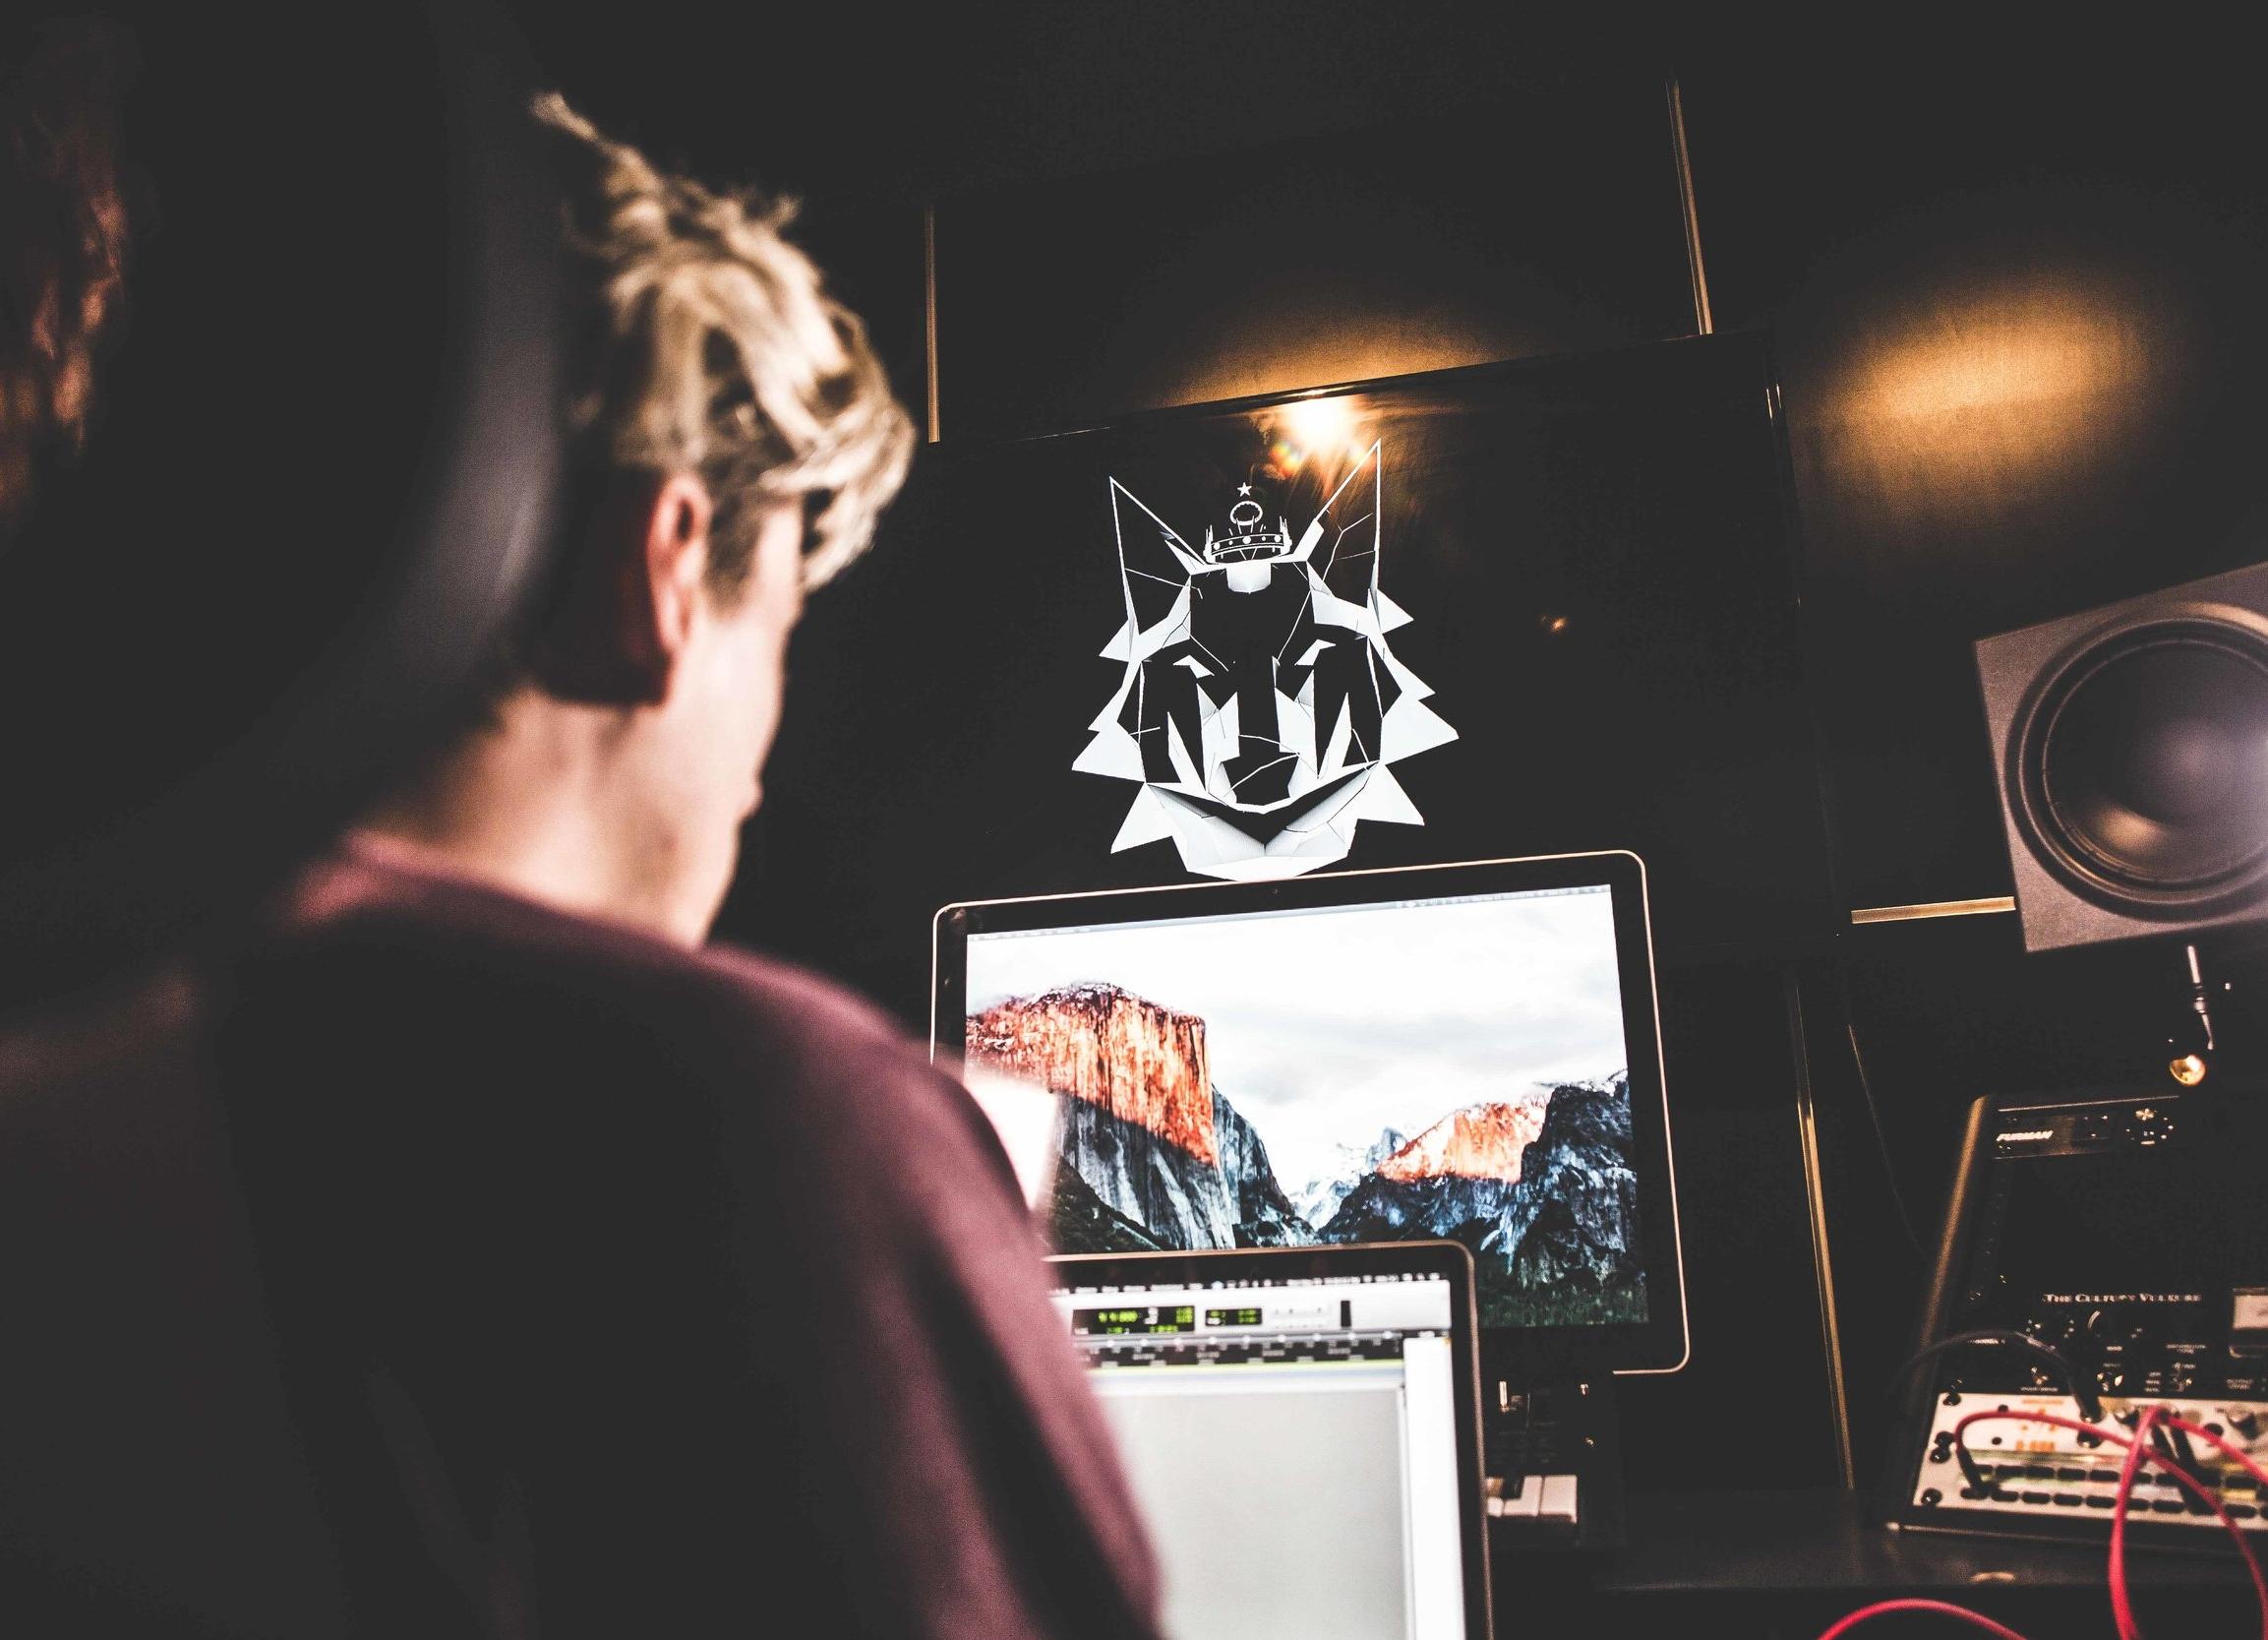 Studio Rental - $50.00/Hour (1-4 hours)$40.00/Hour (4 + hours)